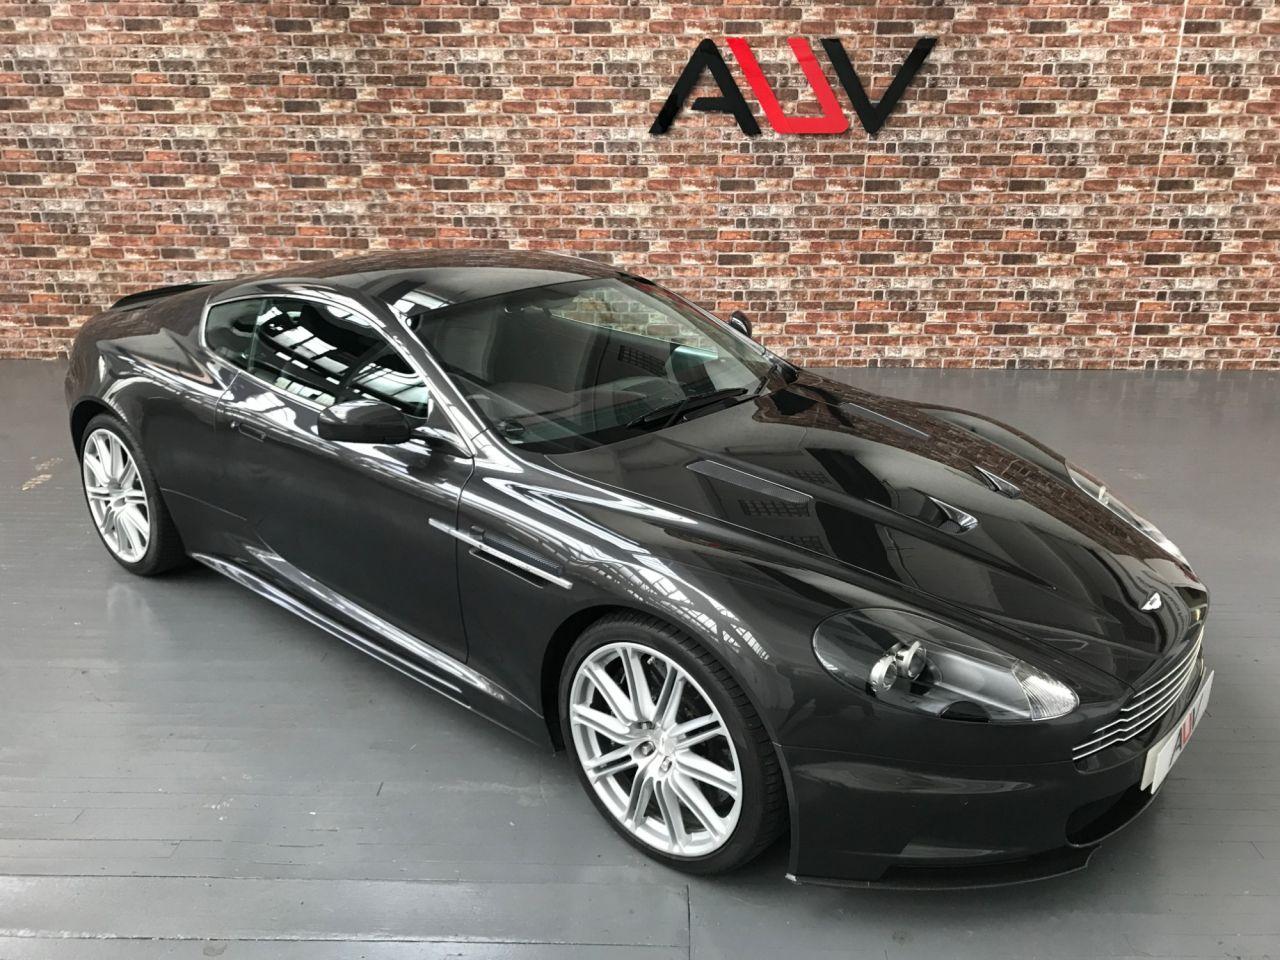 2008 Aston Martin Dbs V12 64 950